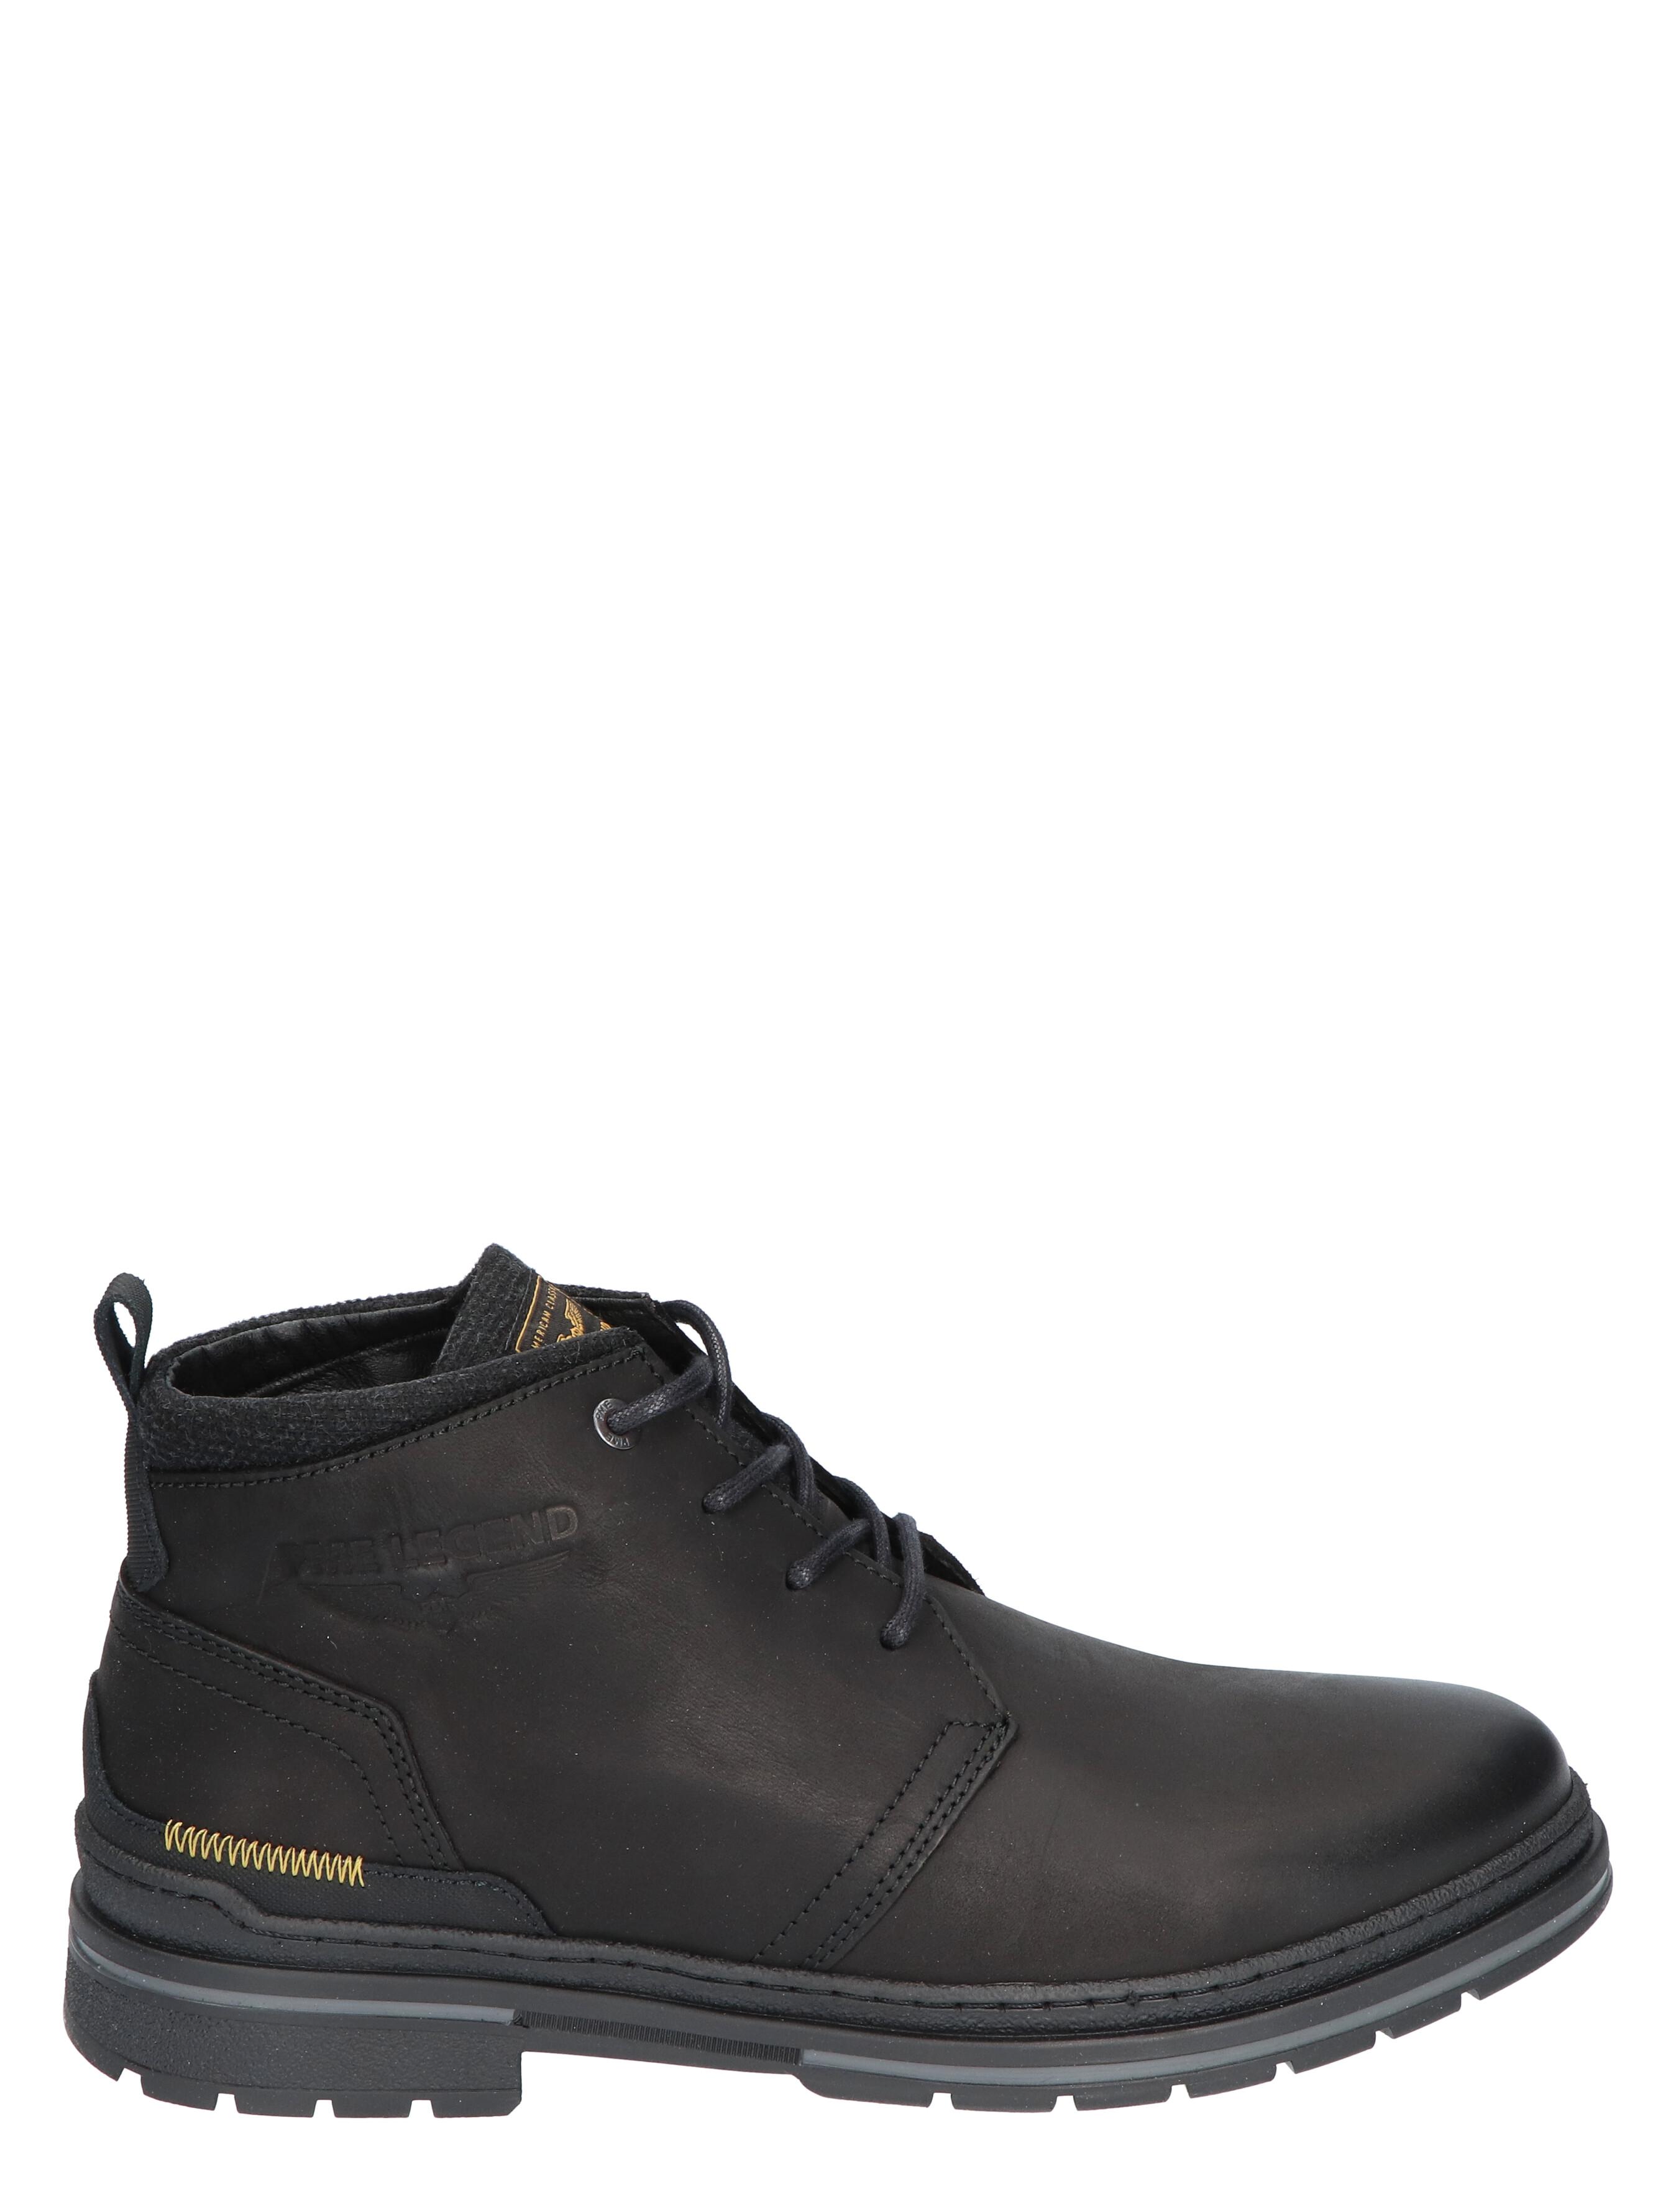 Pme Legend Fleetman PBO216037 999 Black Boots